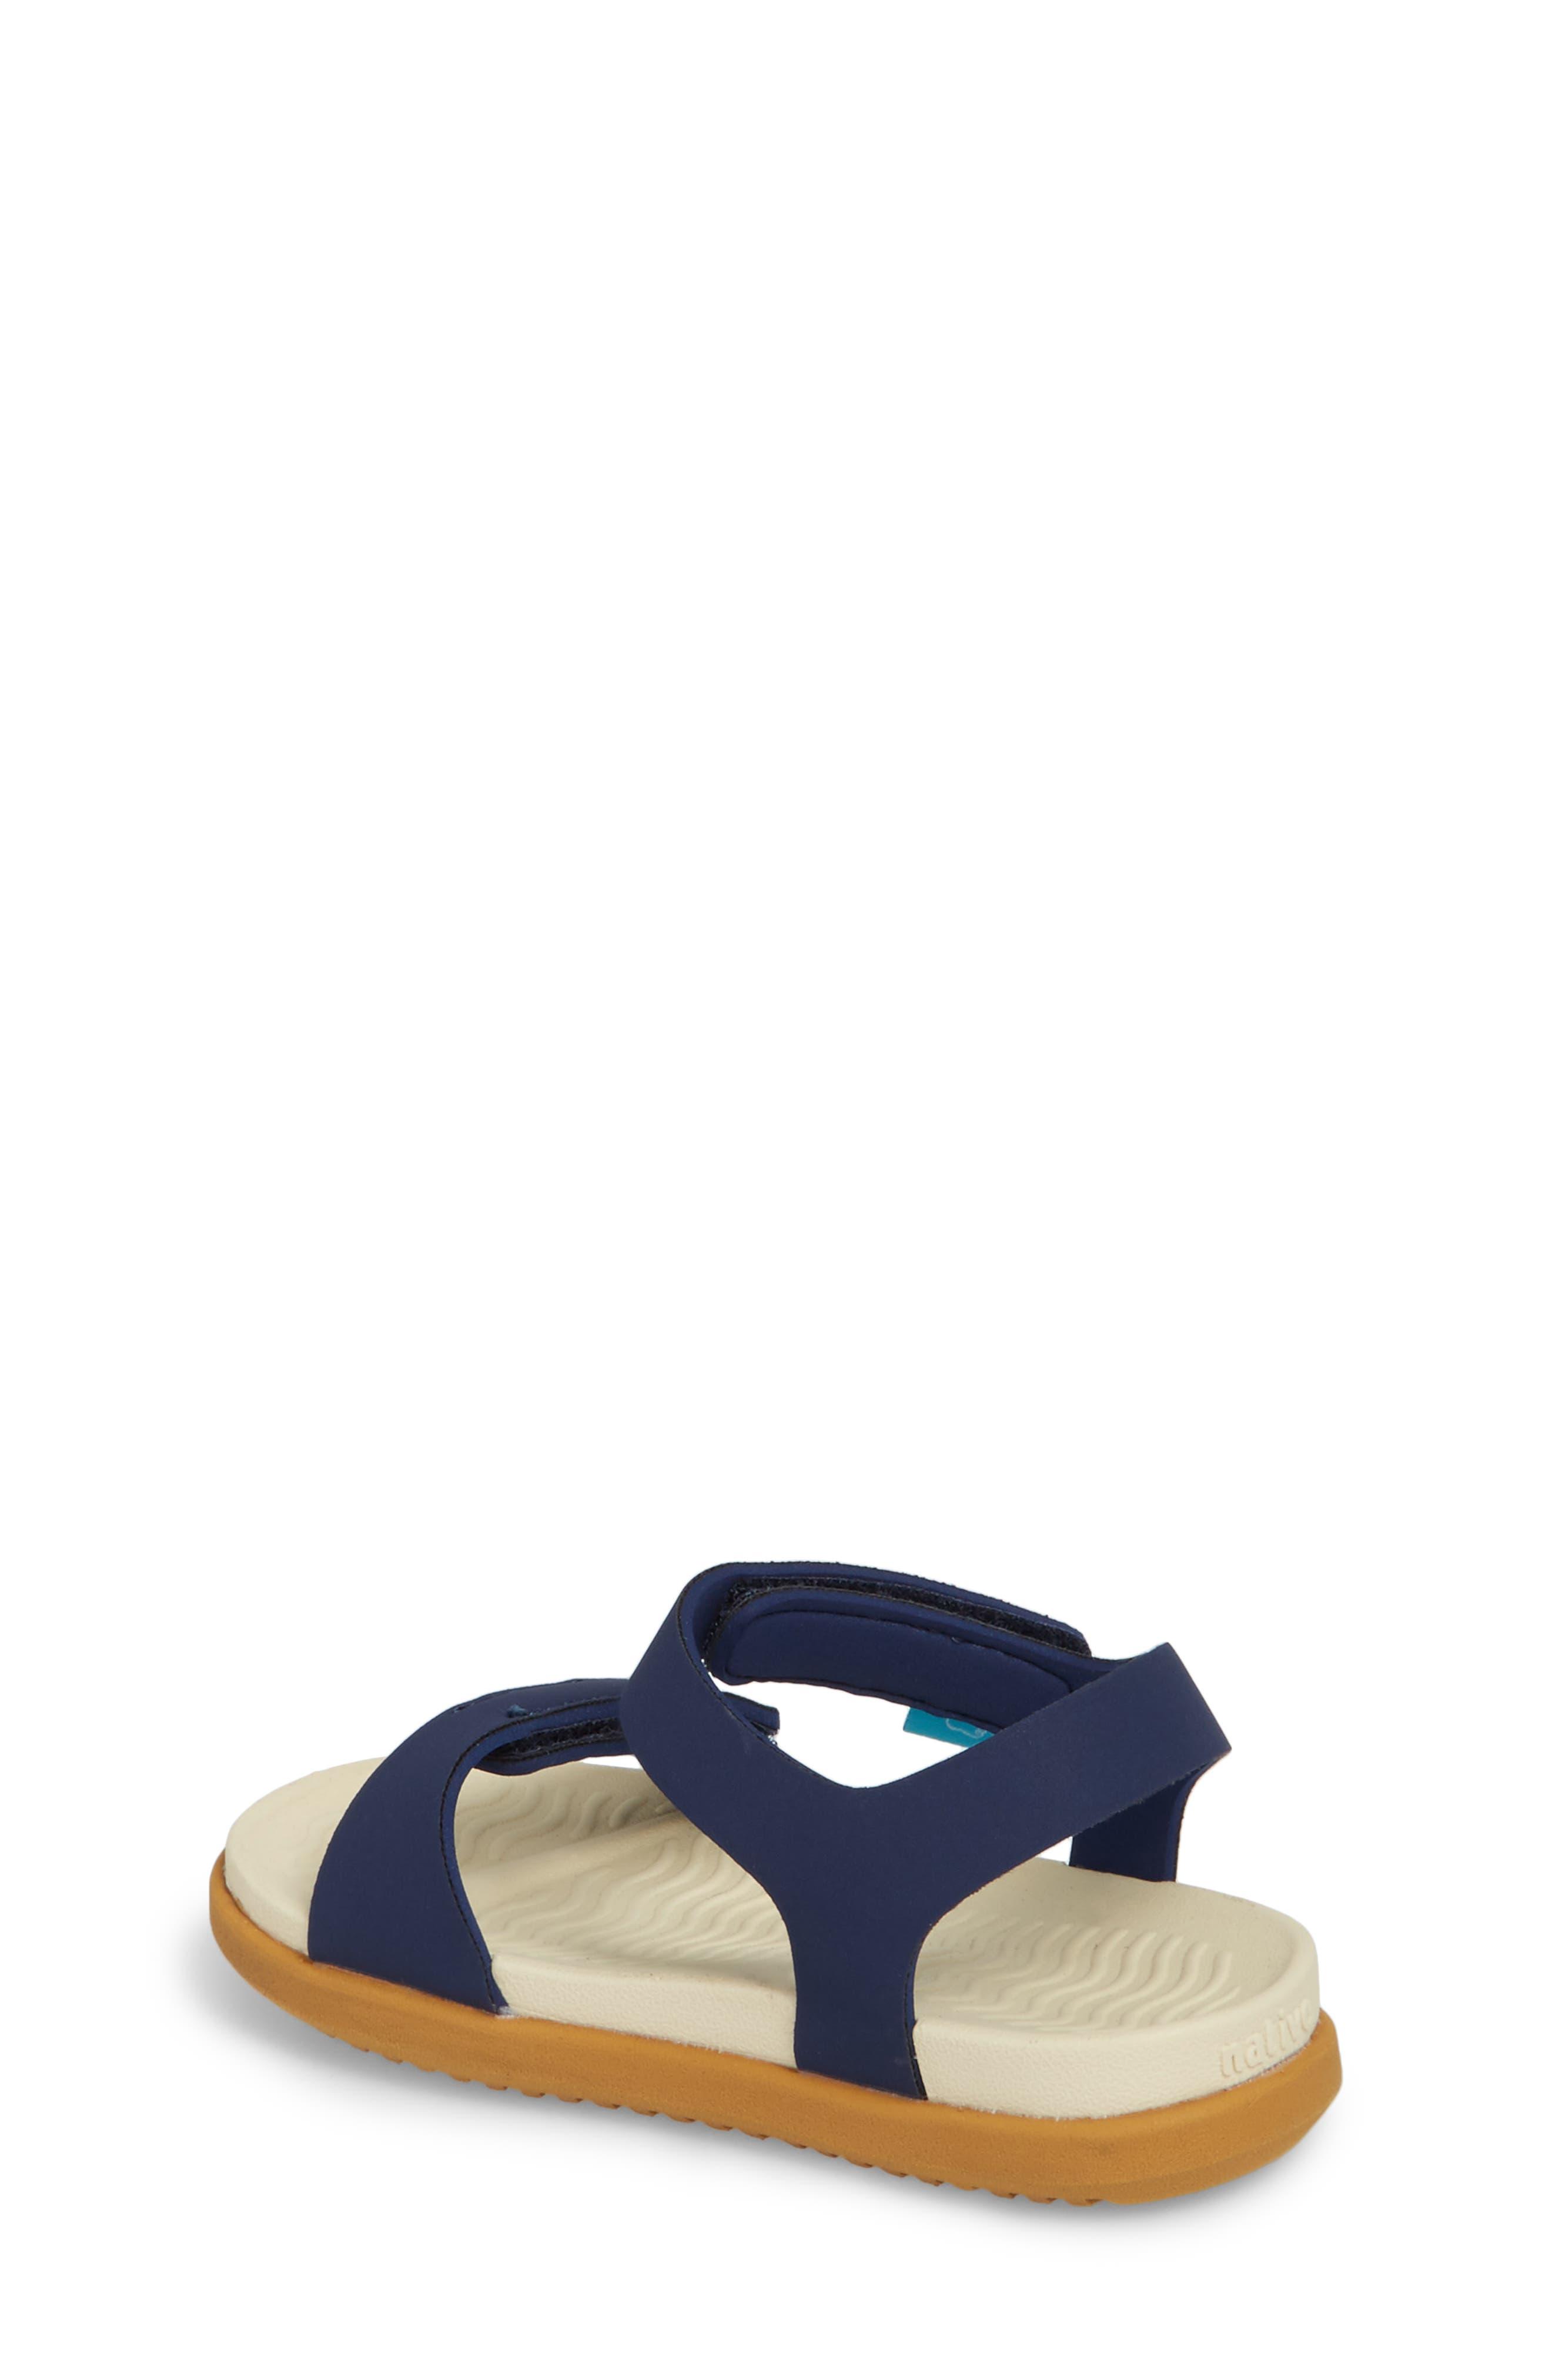 Charley Child Waterproof Flat Sandal,                             Alternate thumbnail 2, color,                             Blue/ Bone White/ Toffee